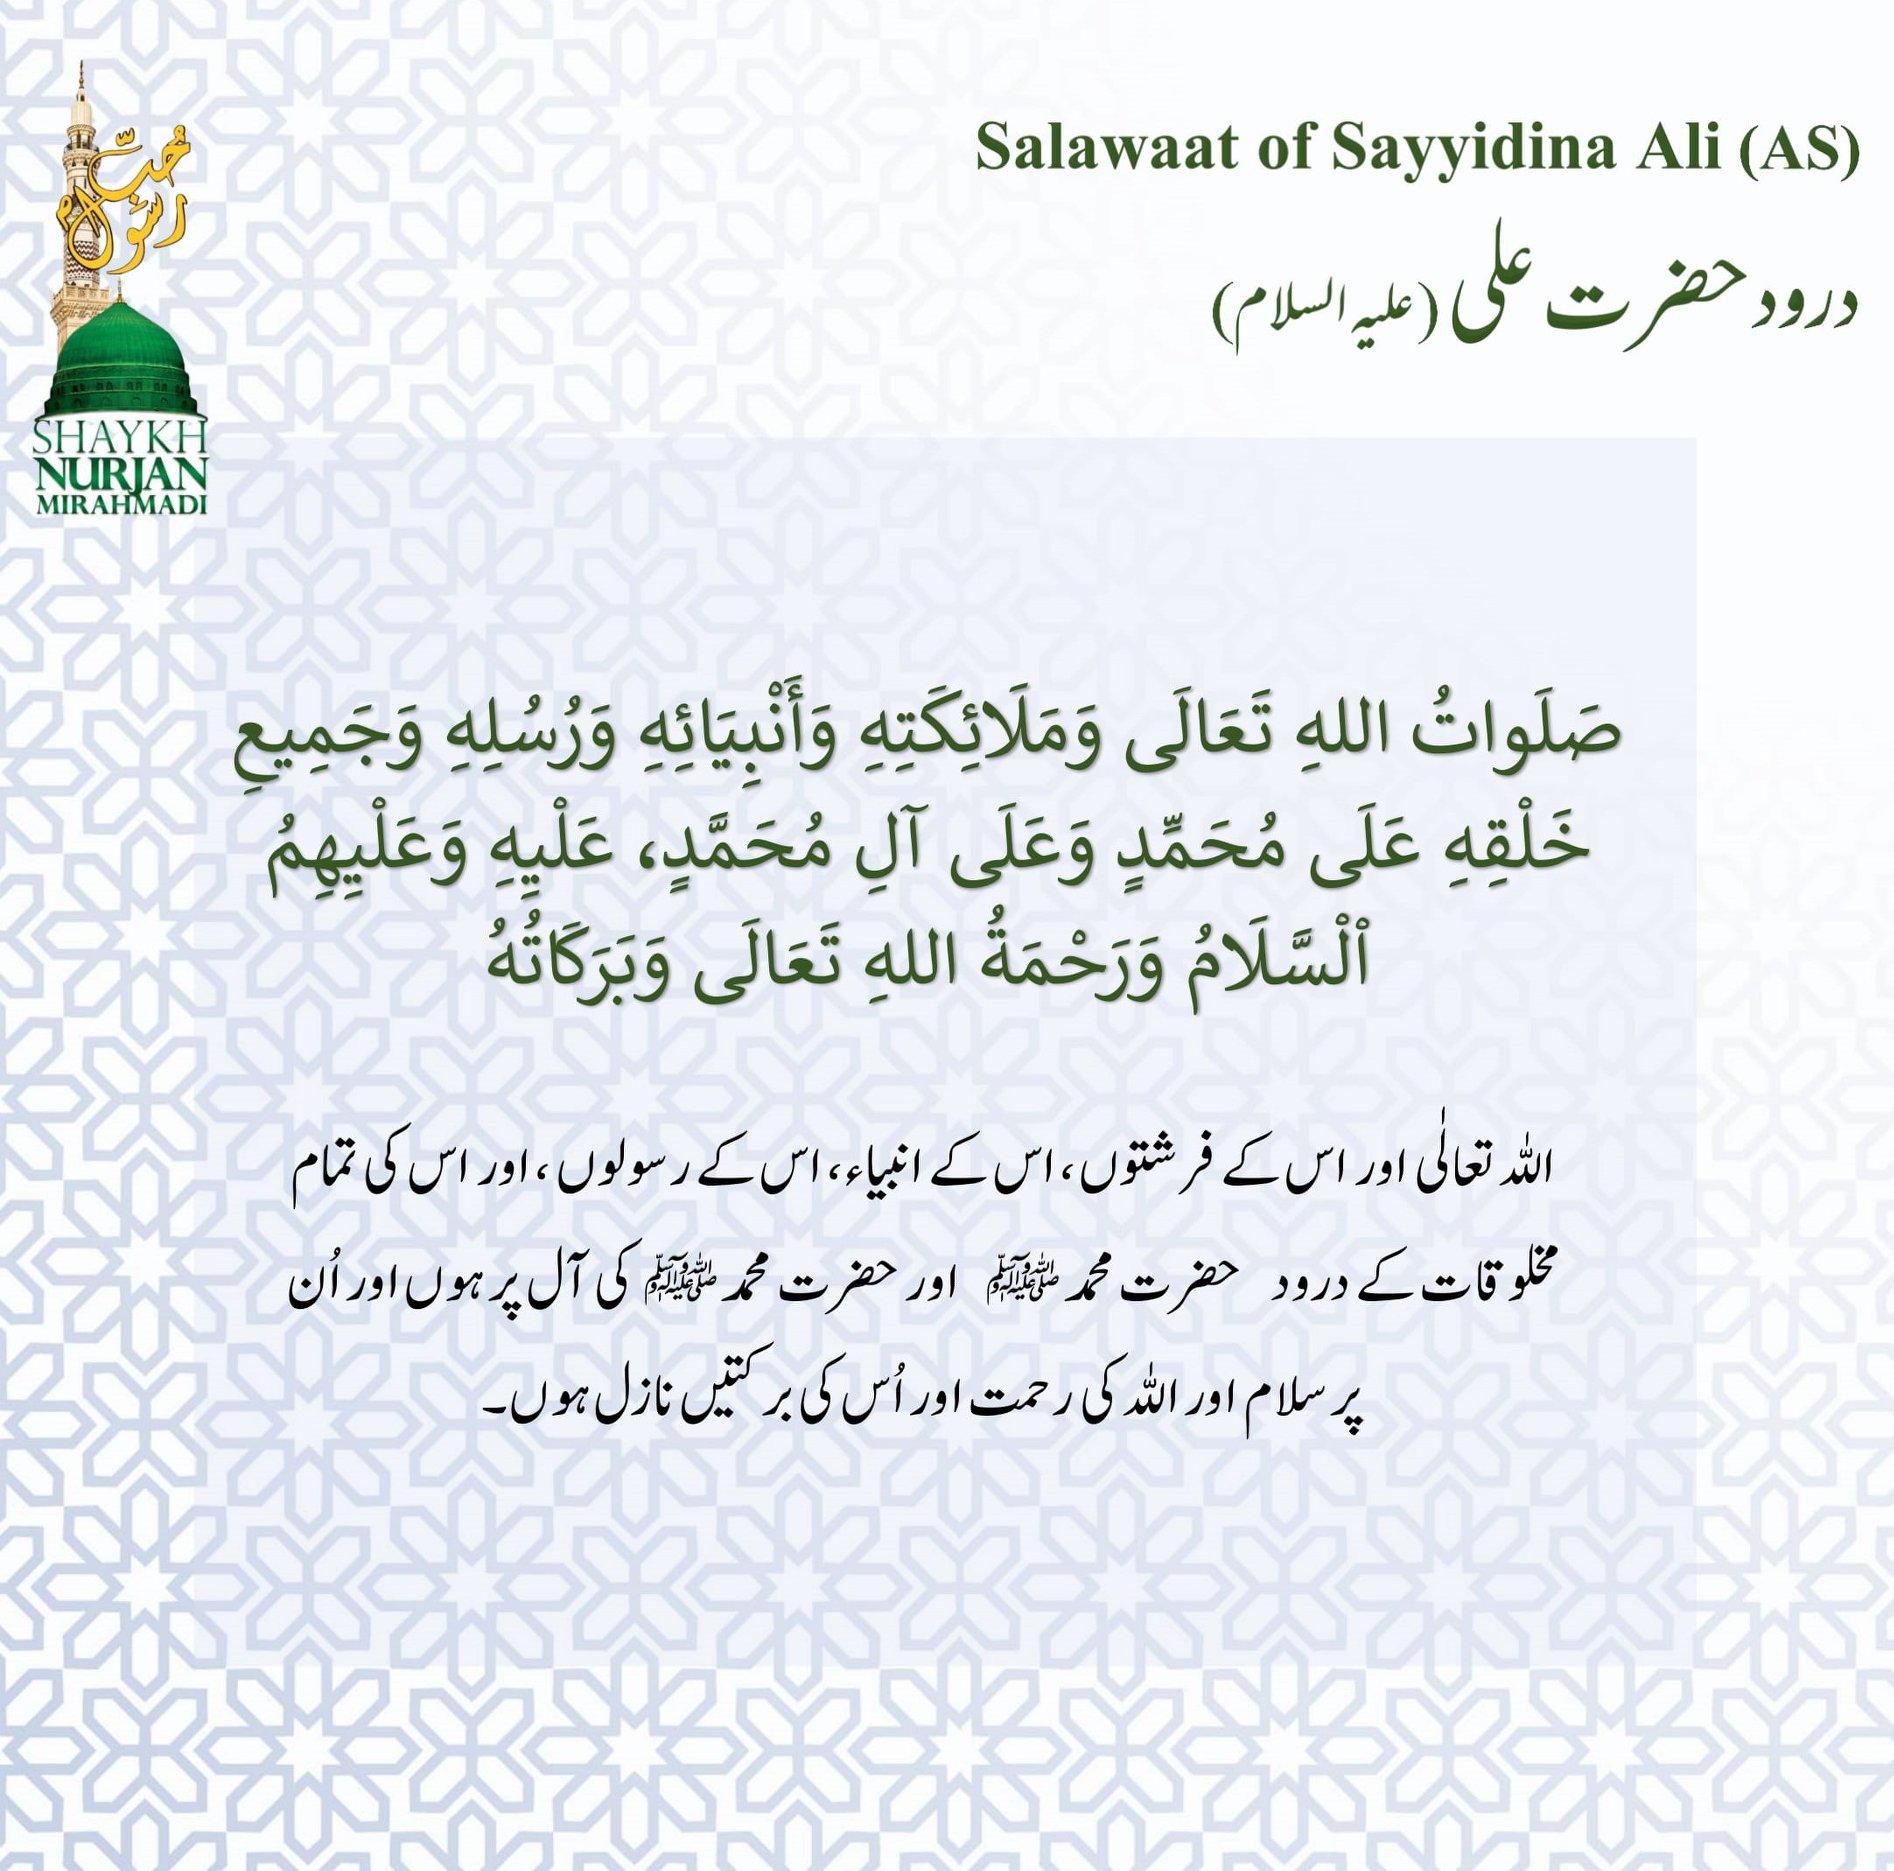 Salawaat of Sayyidina Ali (AS)  درود / صلوٰۃ سیدنا علی (علیہ السلام)  حضرت علی ؑ...